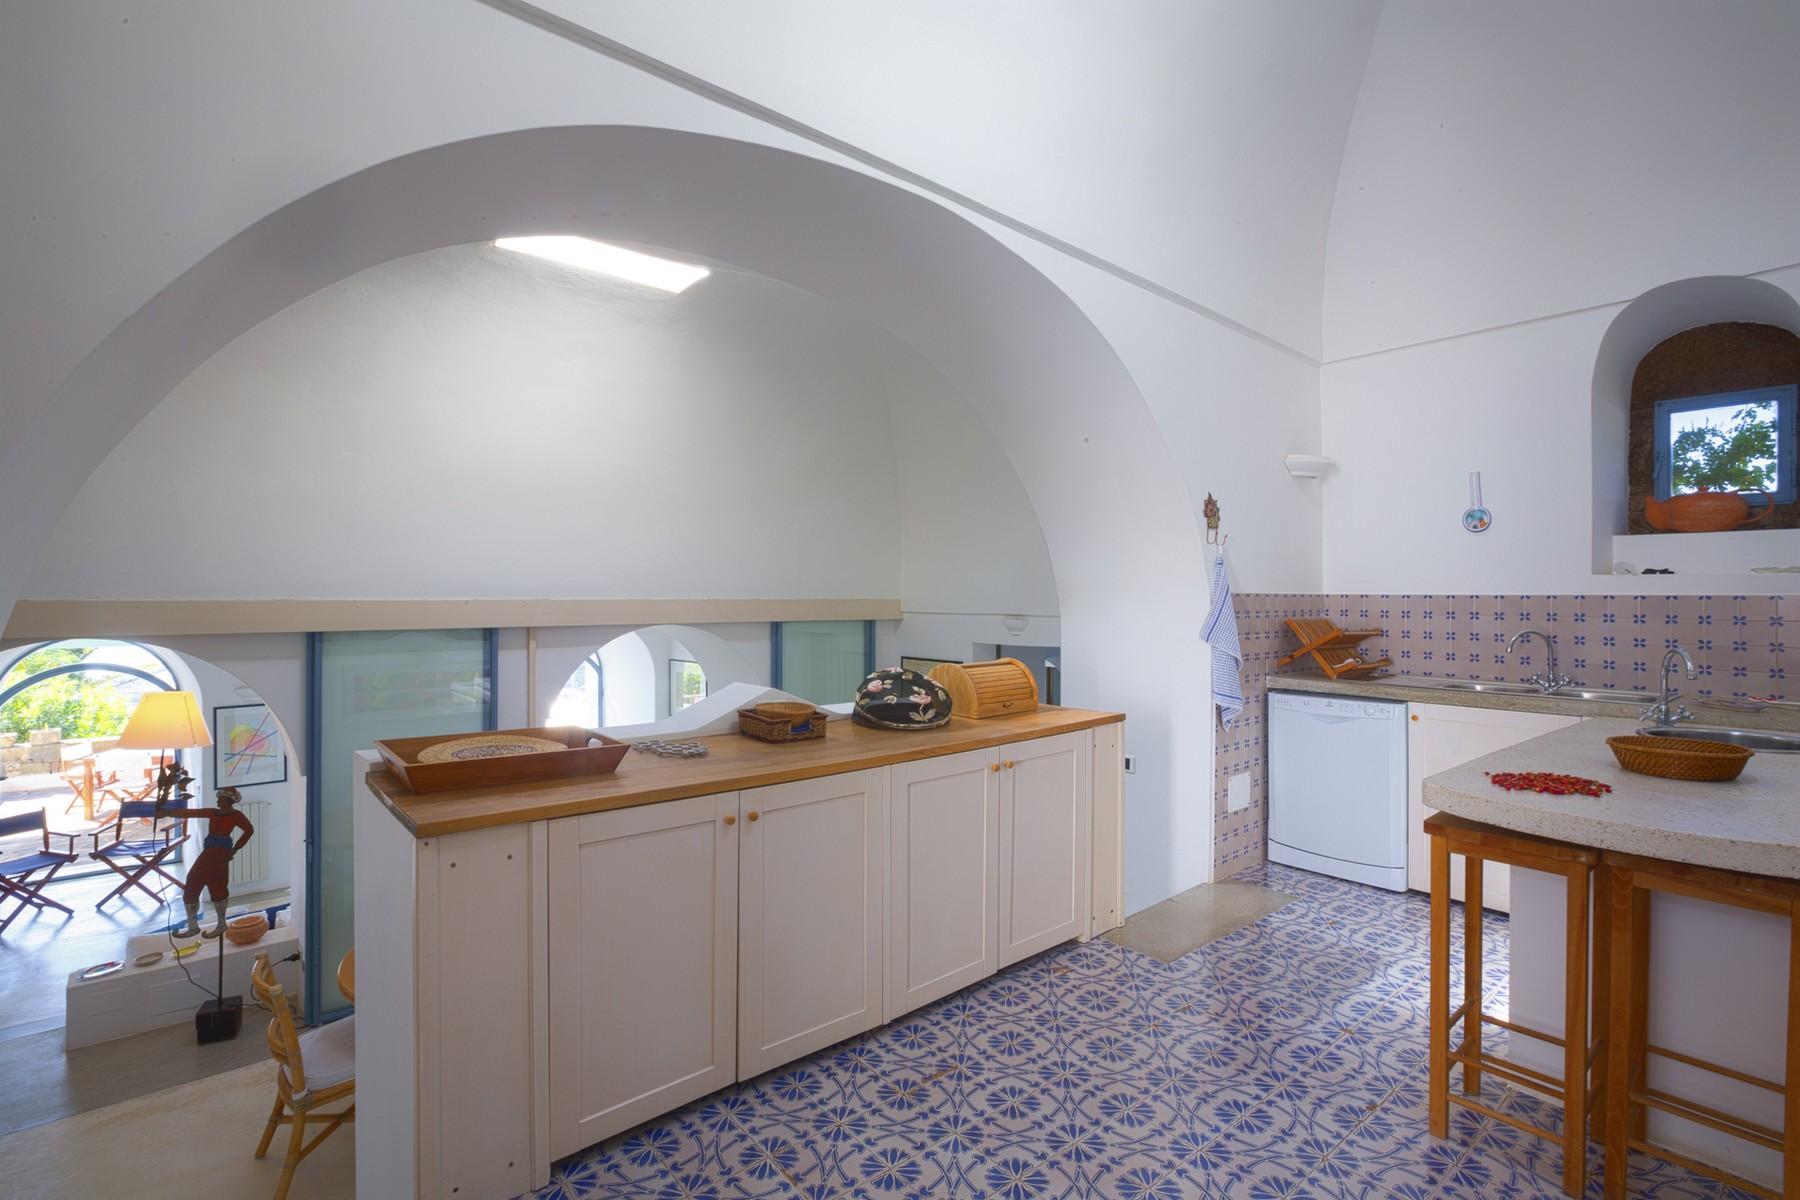 Villa in Vendita a Pantelleria: 5 locali, 530 mq - Foto 13